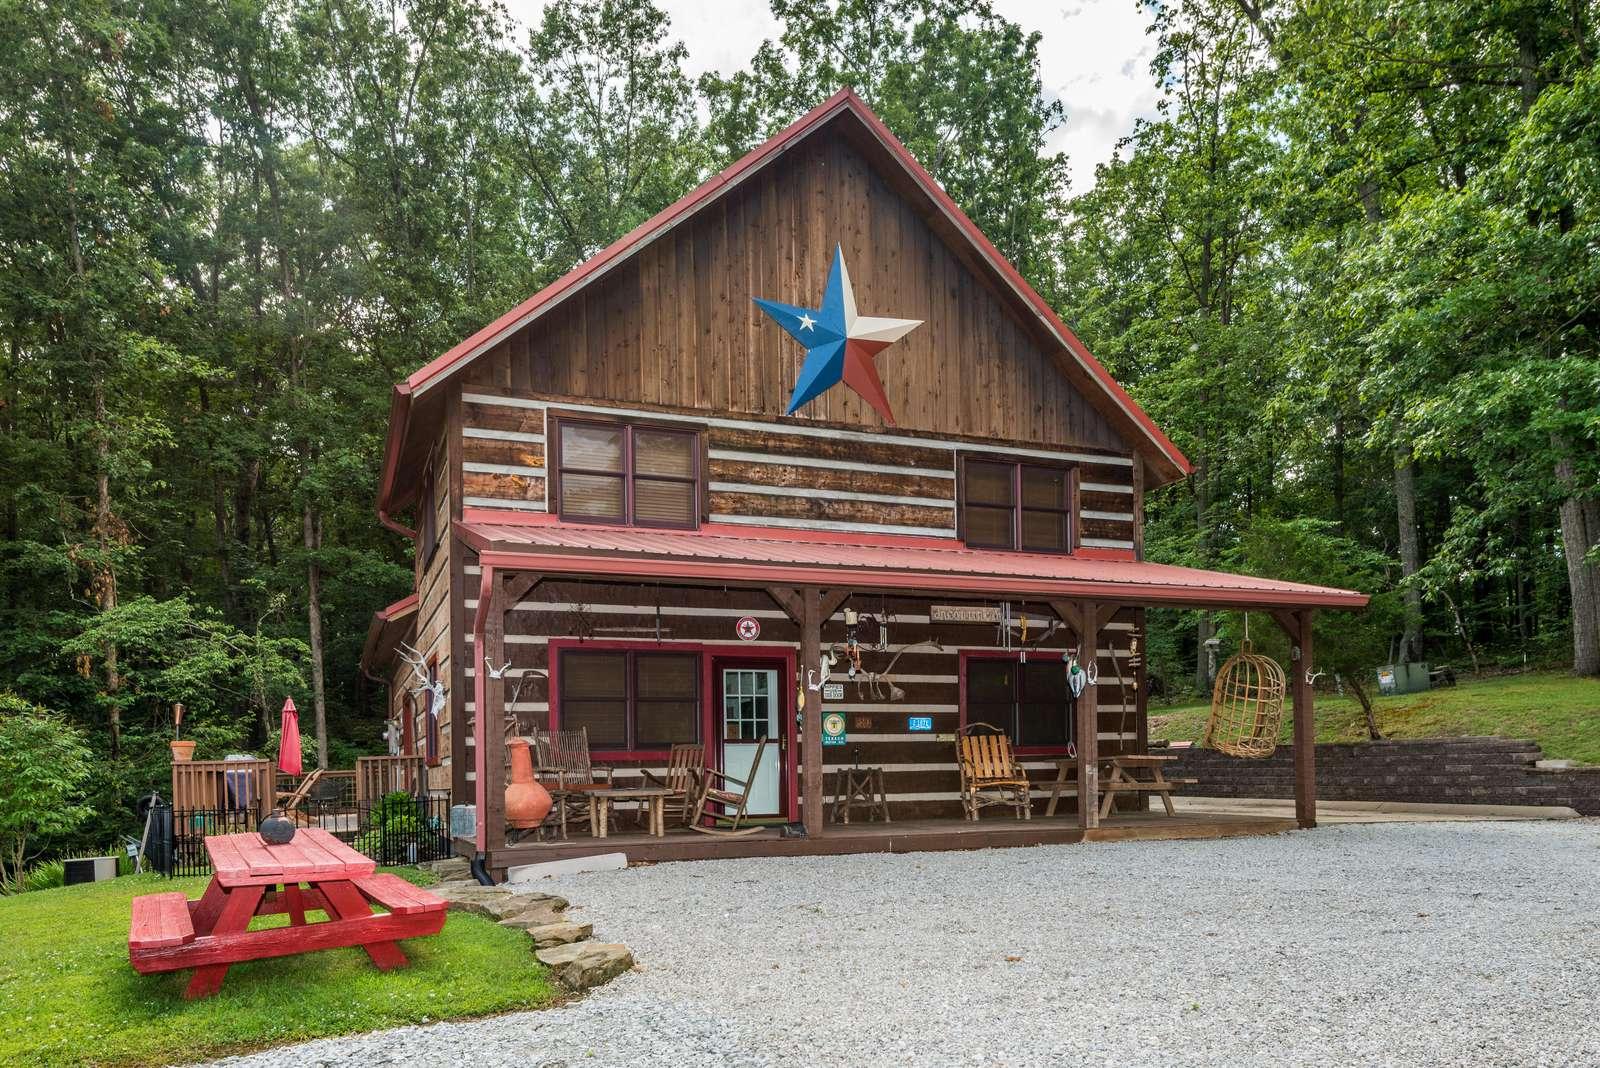 Lonestar Vacation Cabin - property